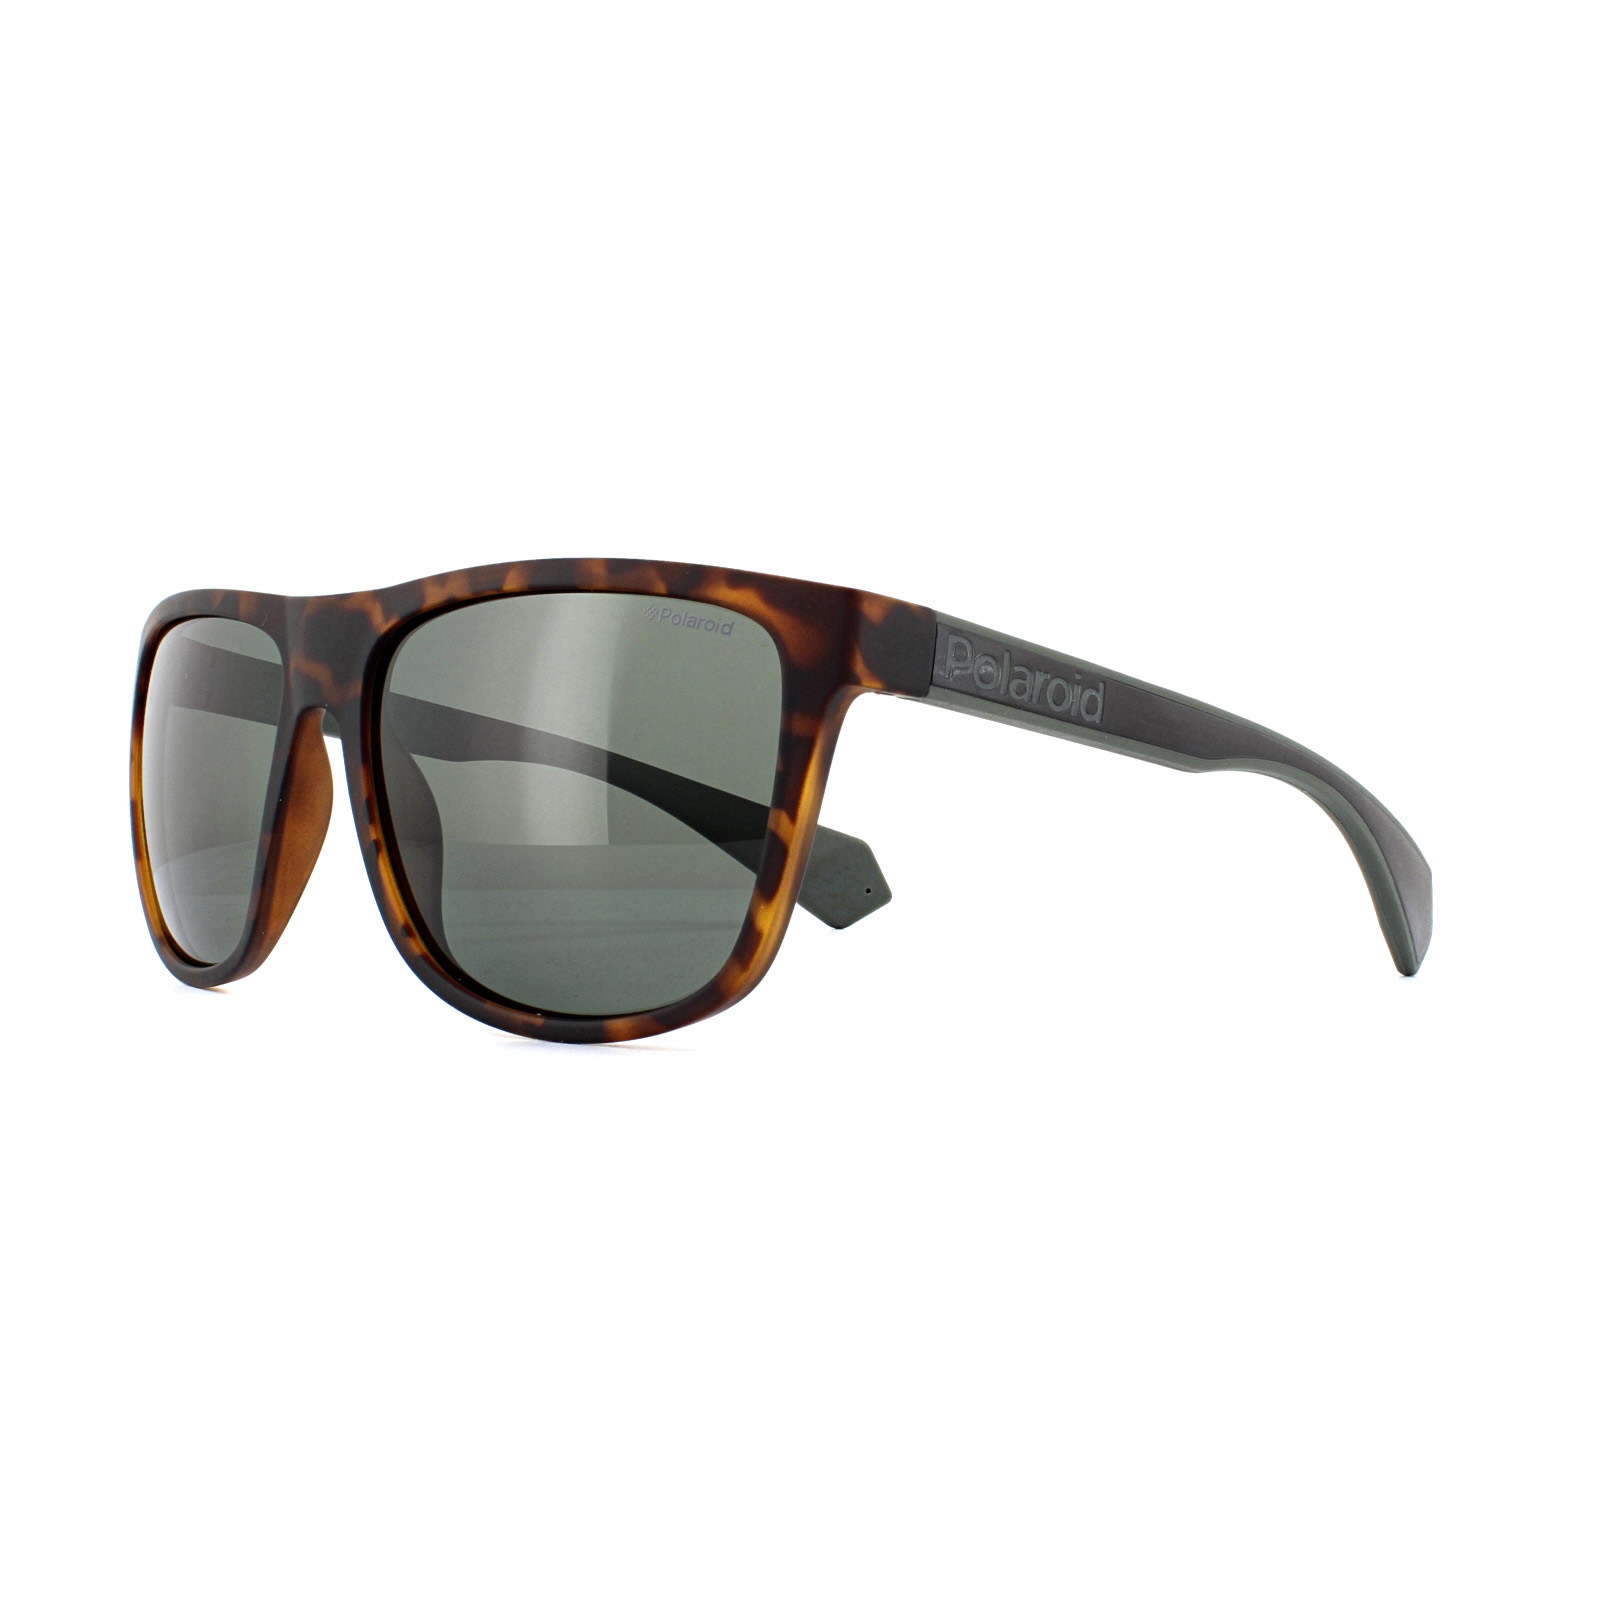 c01671cbacb Sentinel Polaroid Sunglasses PLD 6062 S PHW UC Havana Green Polarized